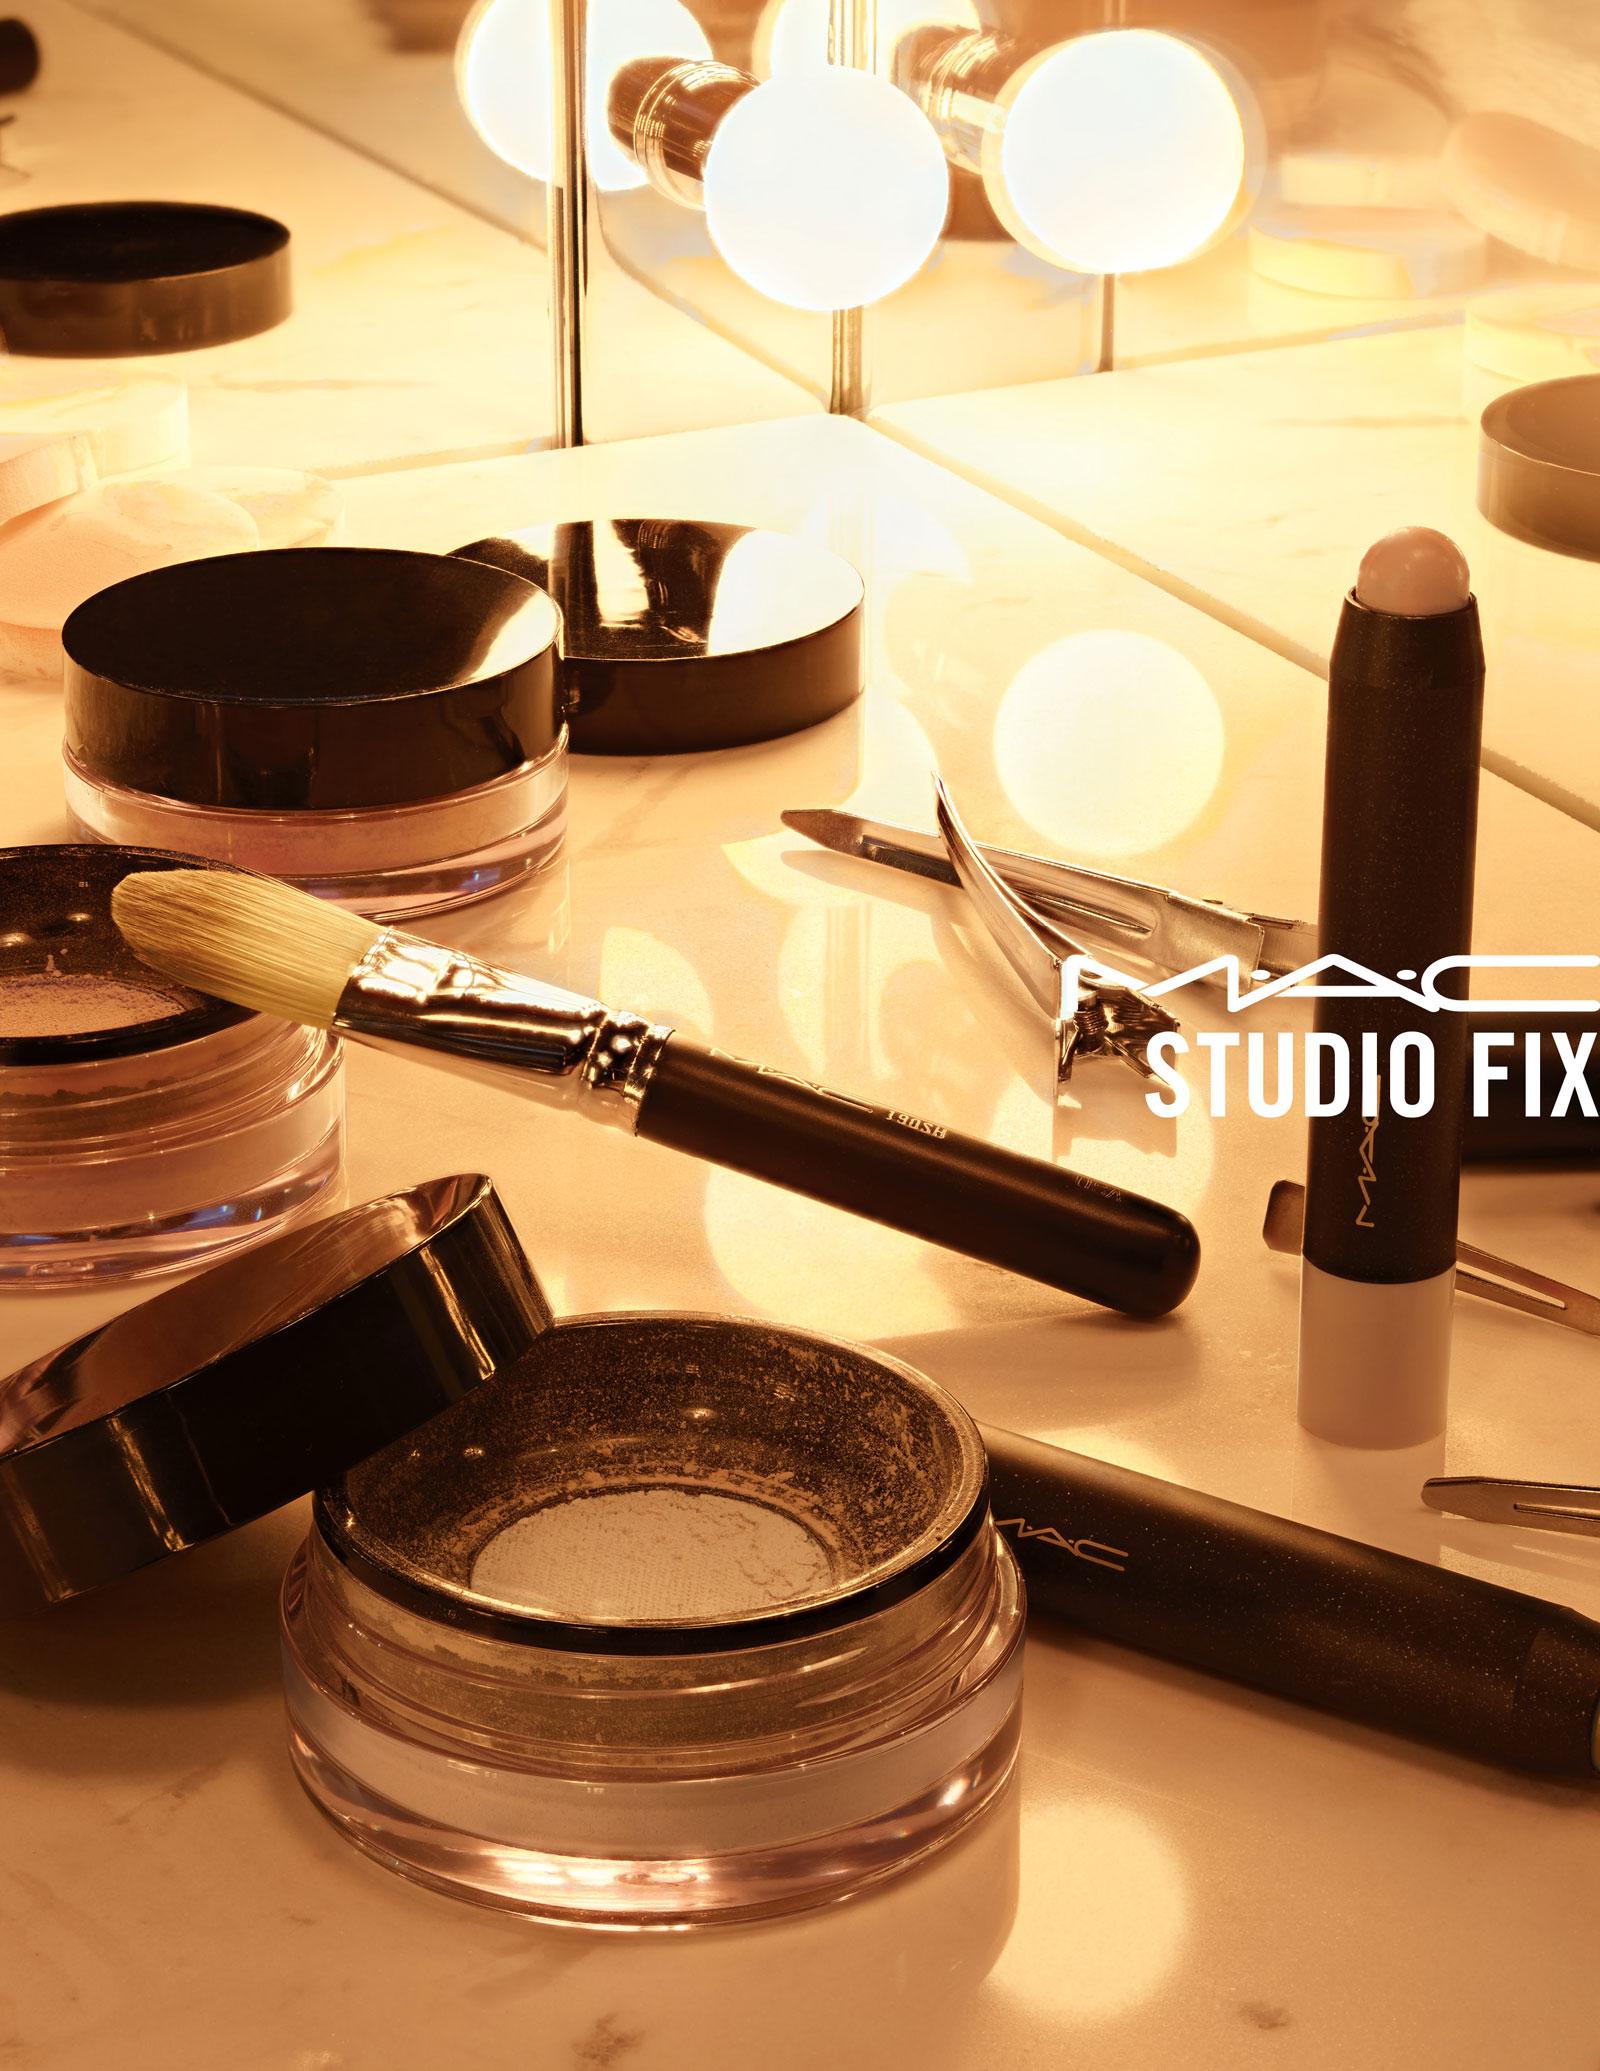 mac-studio-fix-products